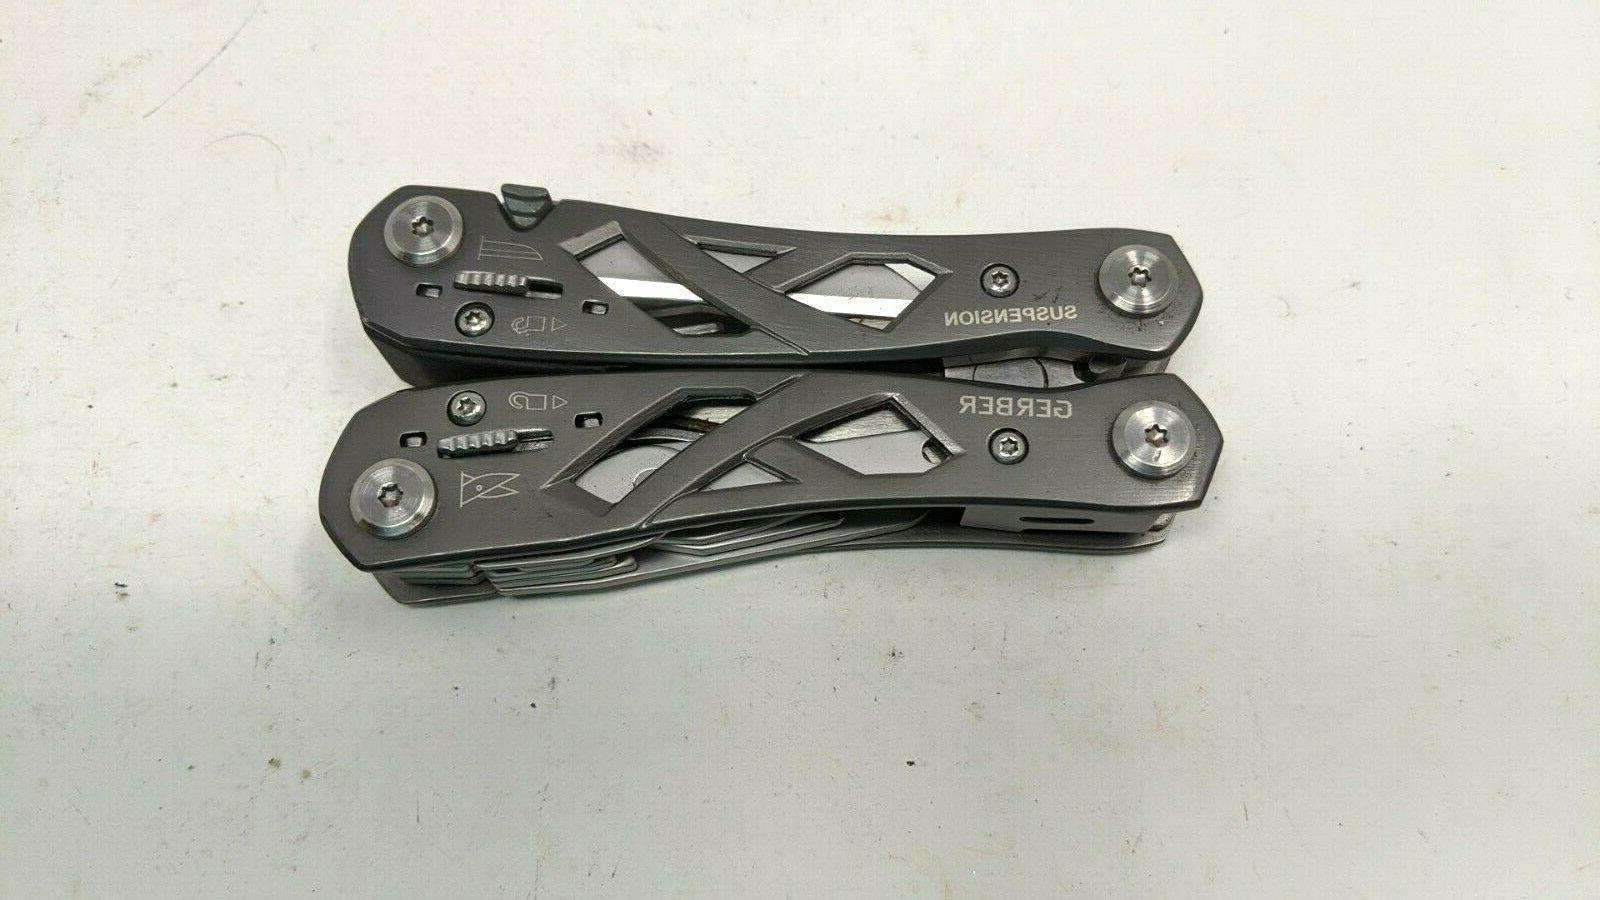 Gerber Suspension Multi Tool Pliers Cutters 12 in 1 Gray